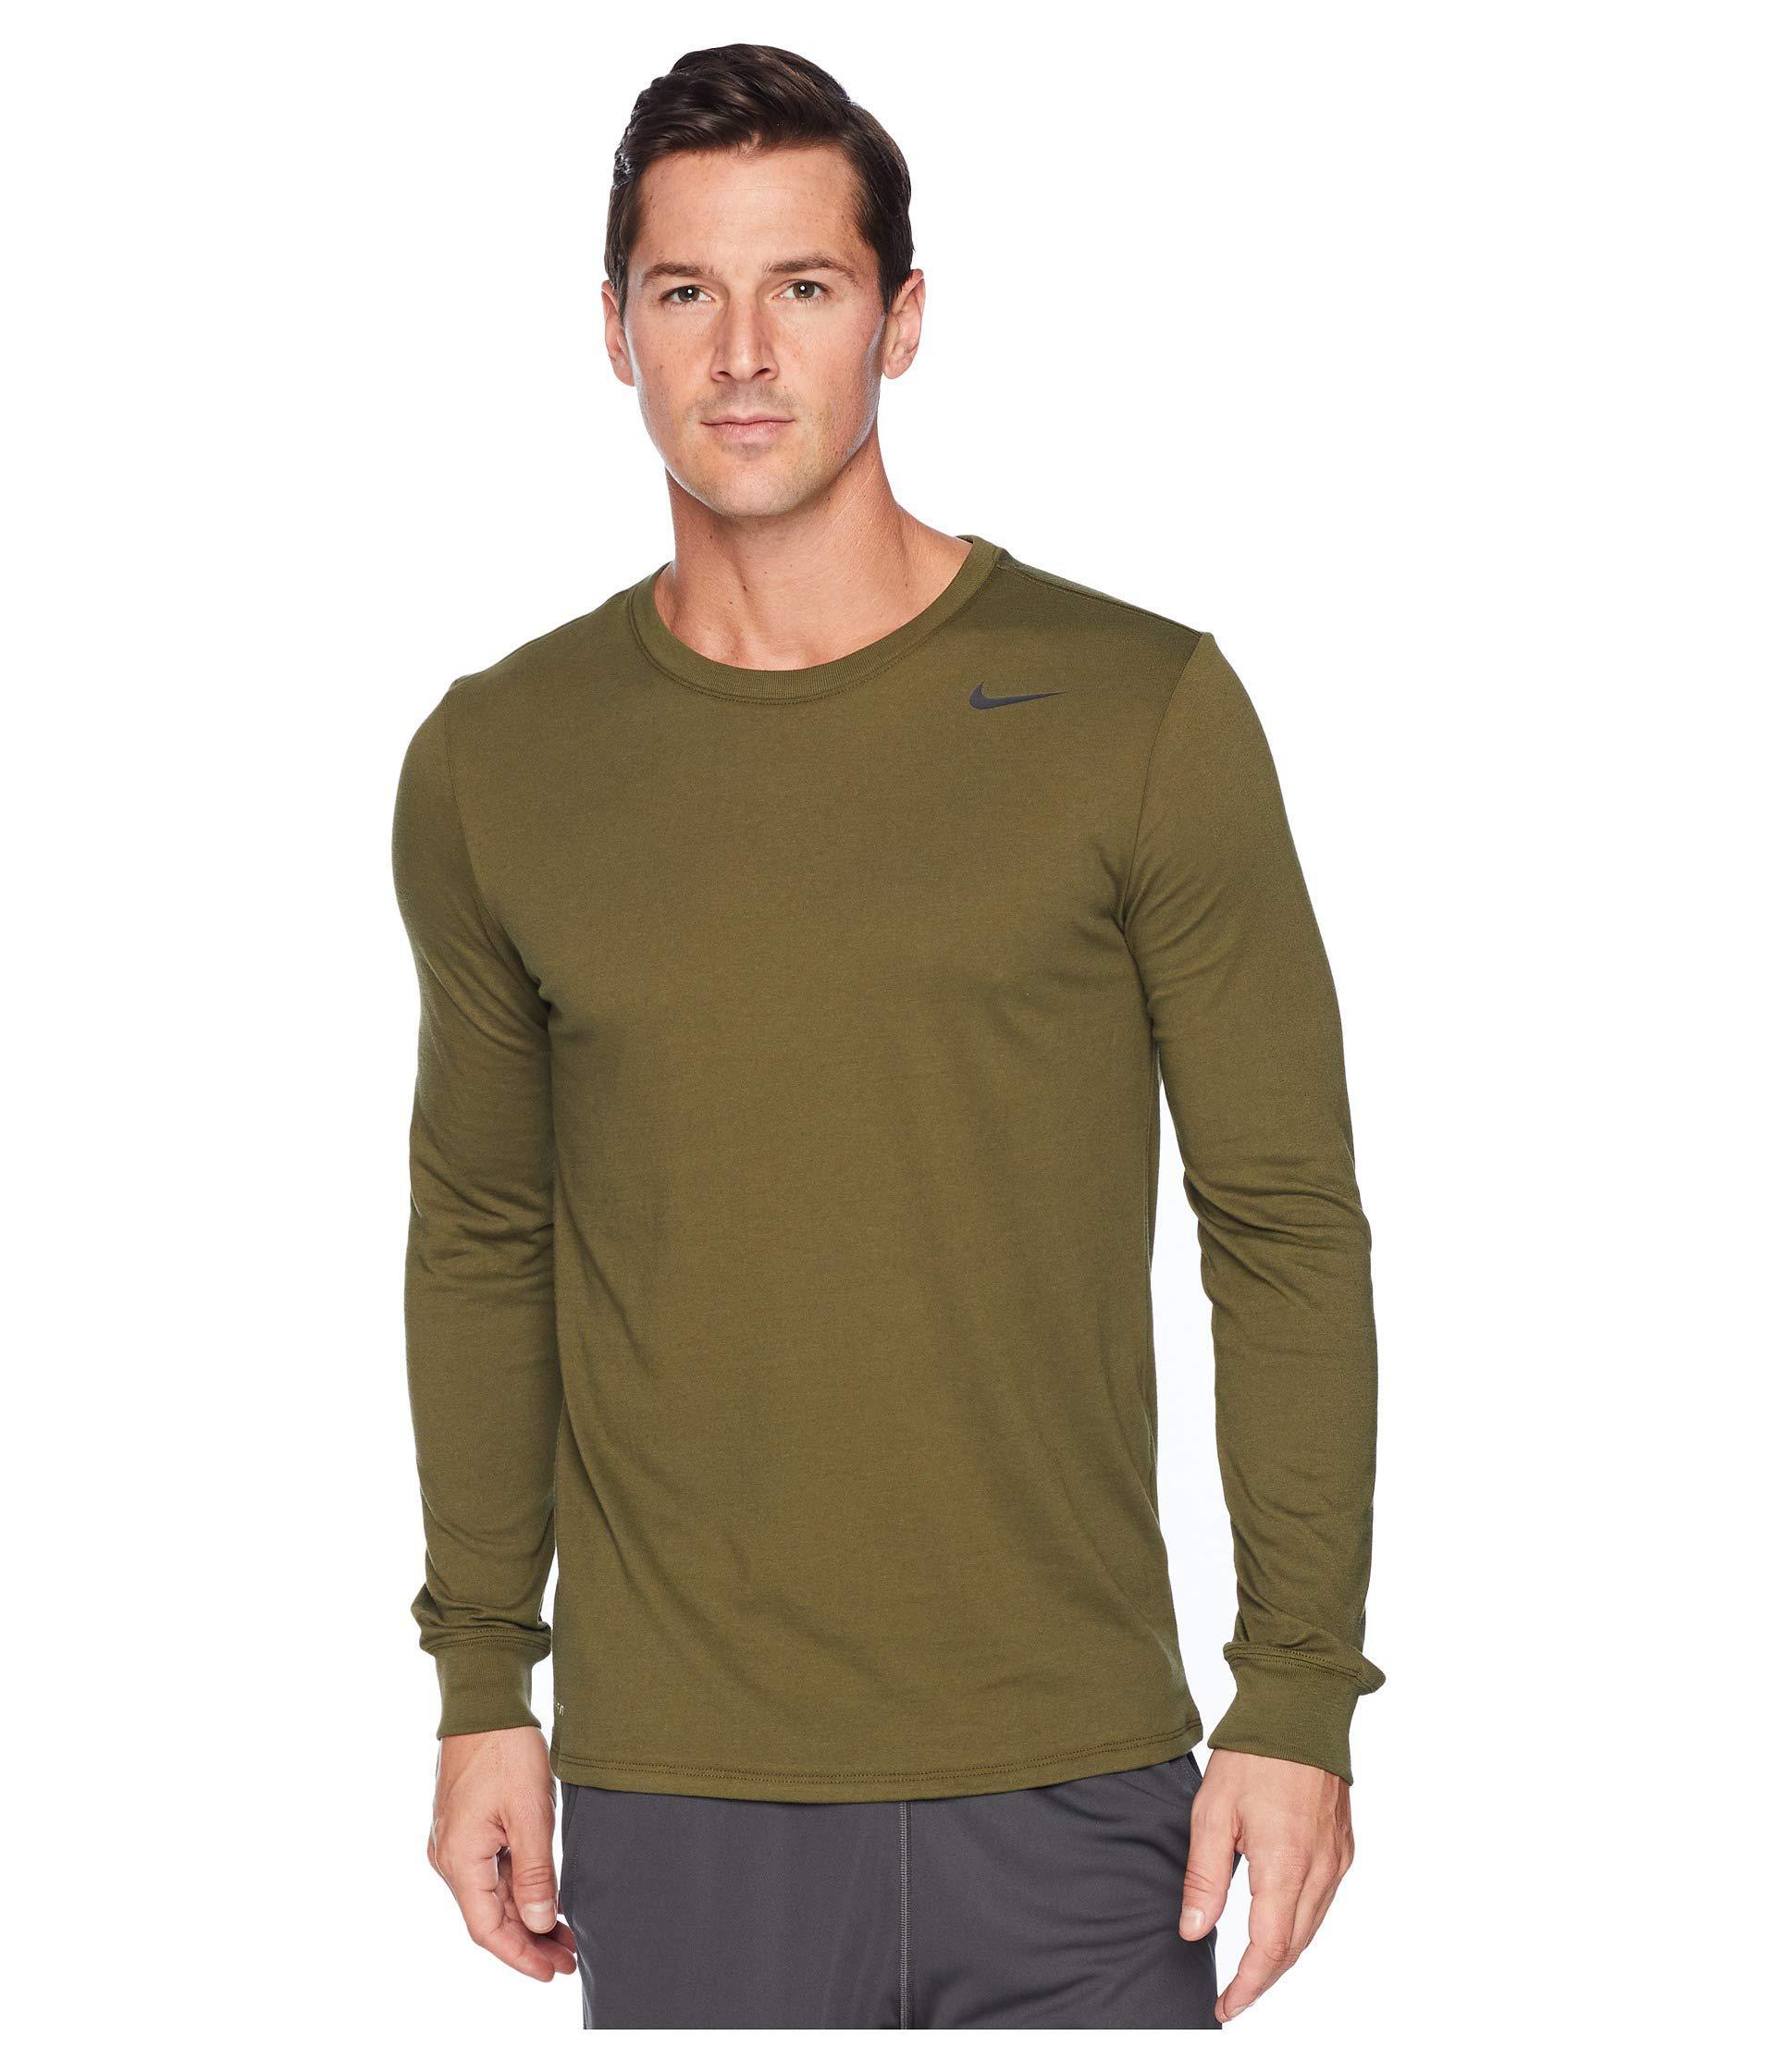 bcc483ddd44 Lyst - Nike Dry Training Long Sleeve T-shirt (black anthracite ...